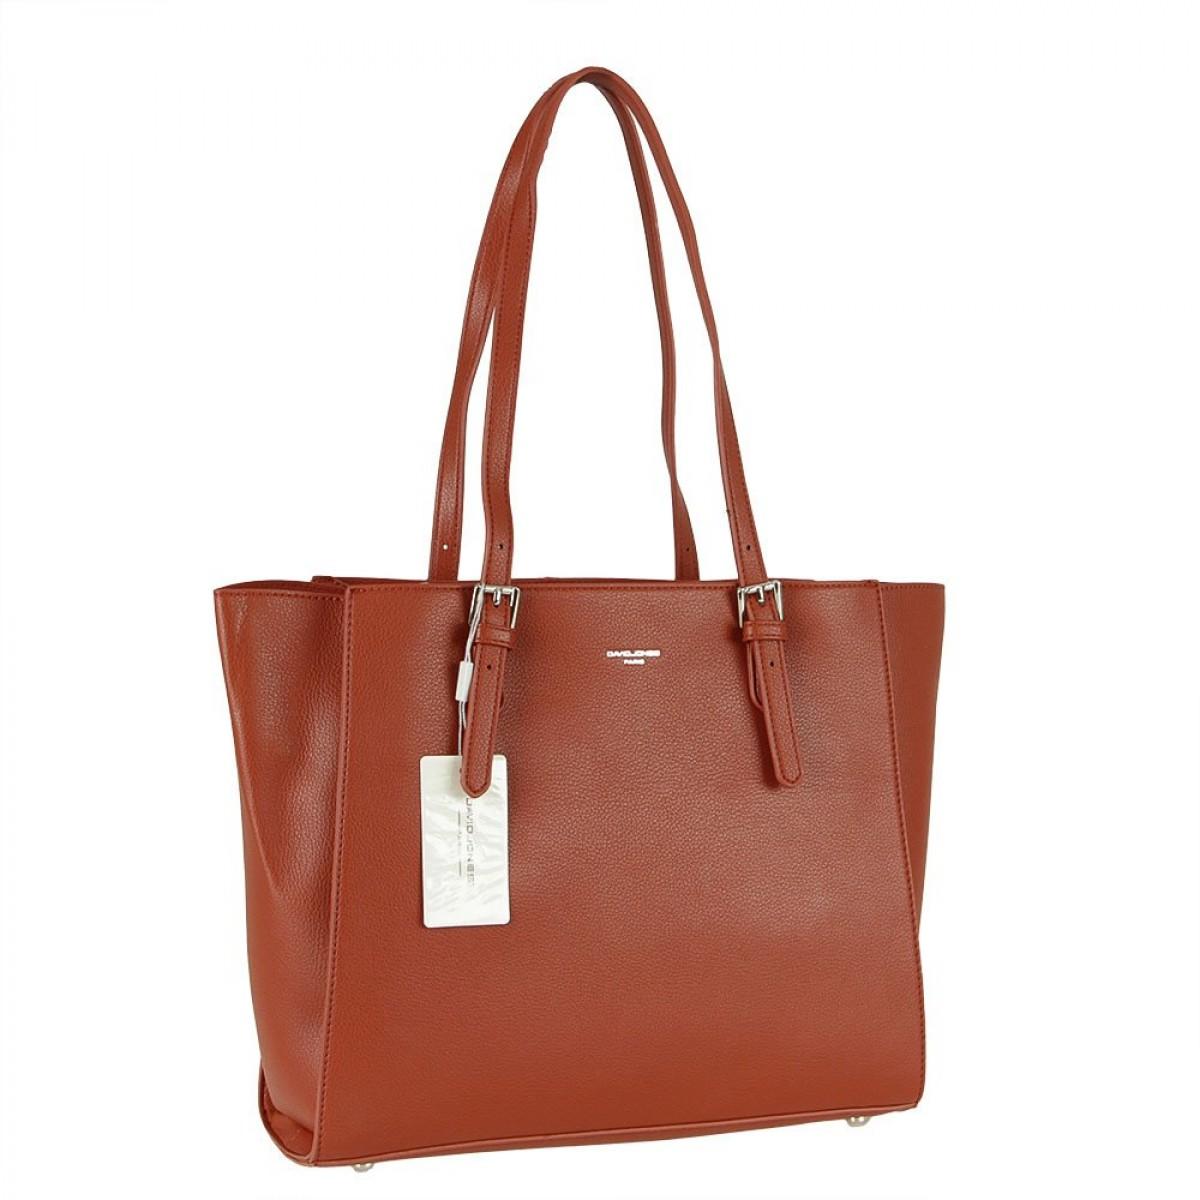 Жіноча сумка David Jones CM5872 SIENNA